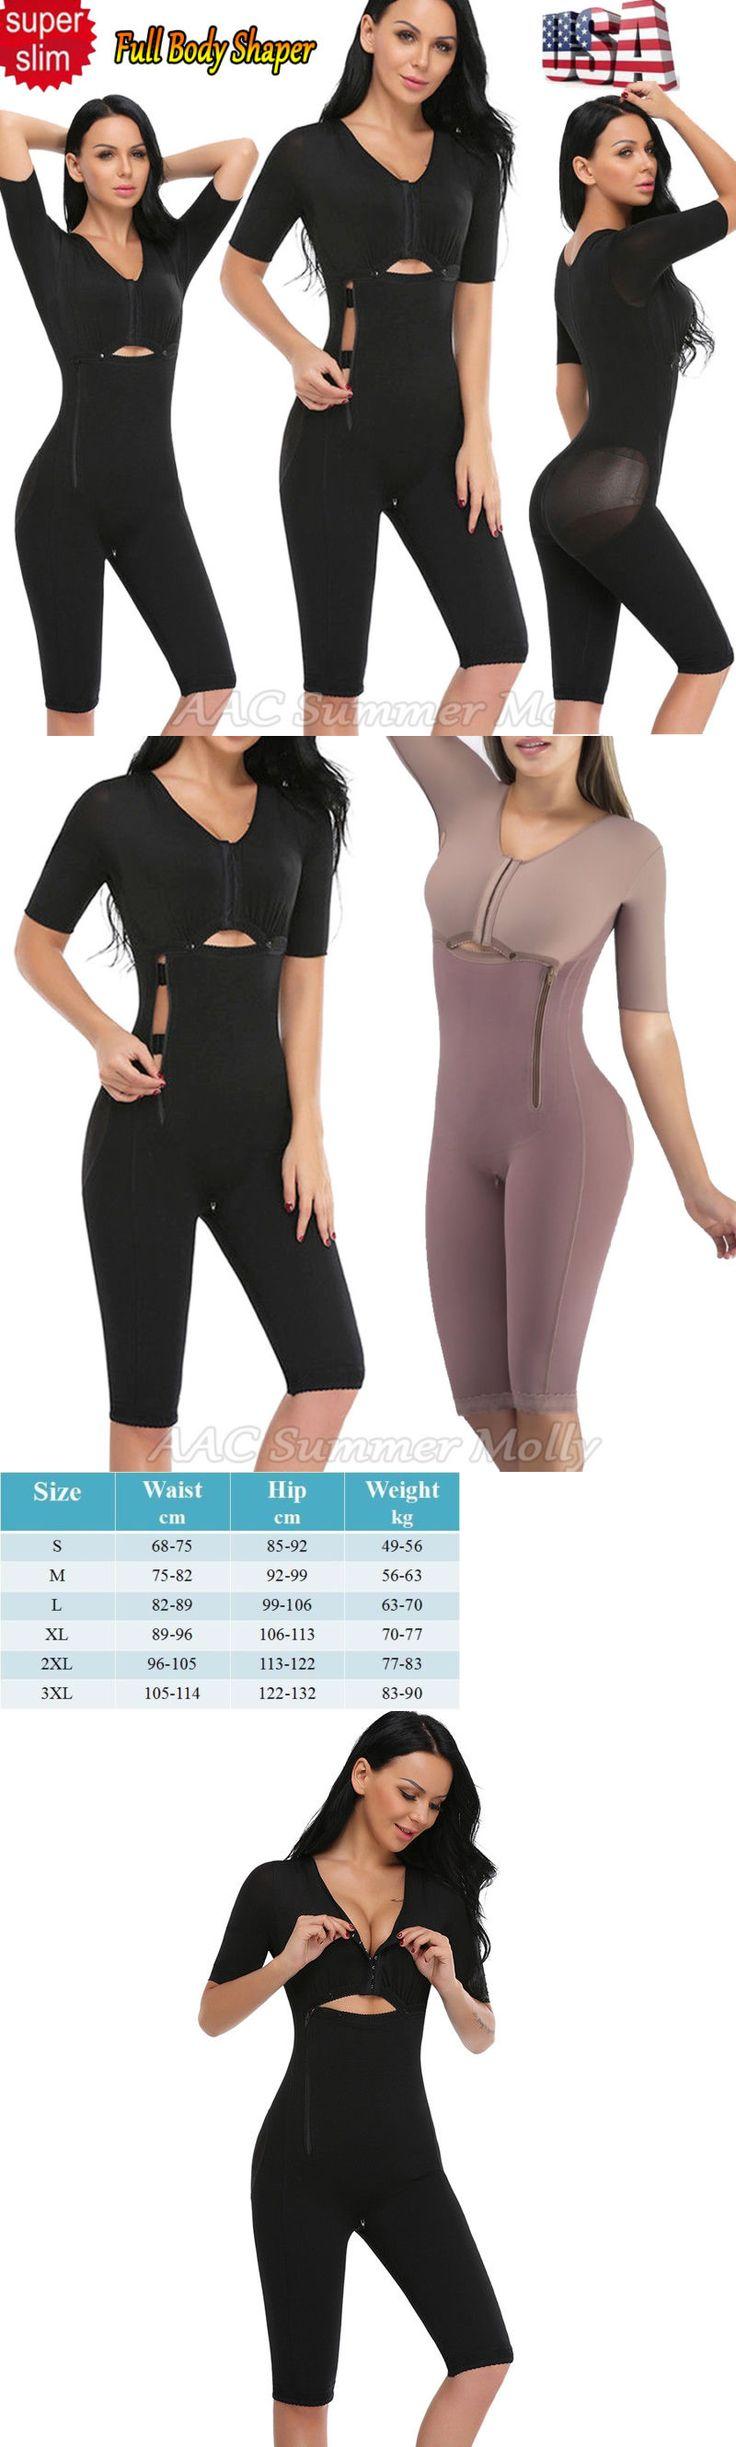 Shapewear 11530: Fajas Colombianas Full Body Arm Shaper Post-Surgery Body Suit Powernet Girdle Us -> BUY IT NOW ONLY: $47.49 on eBay!